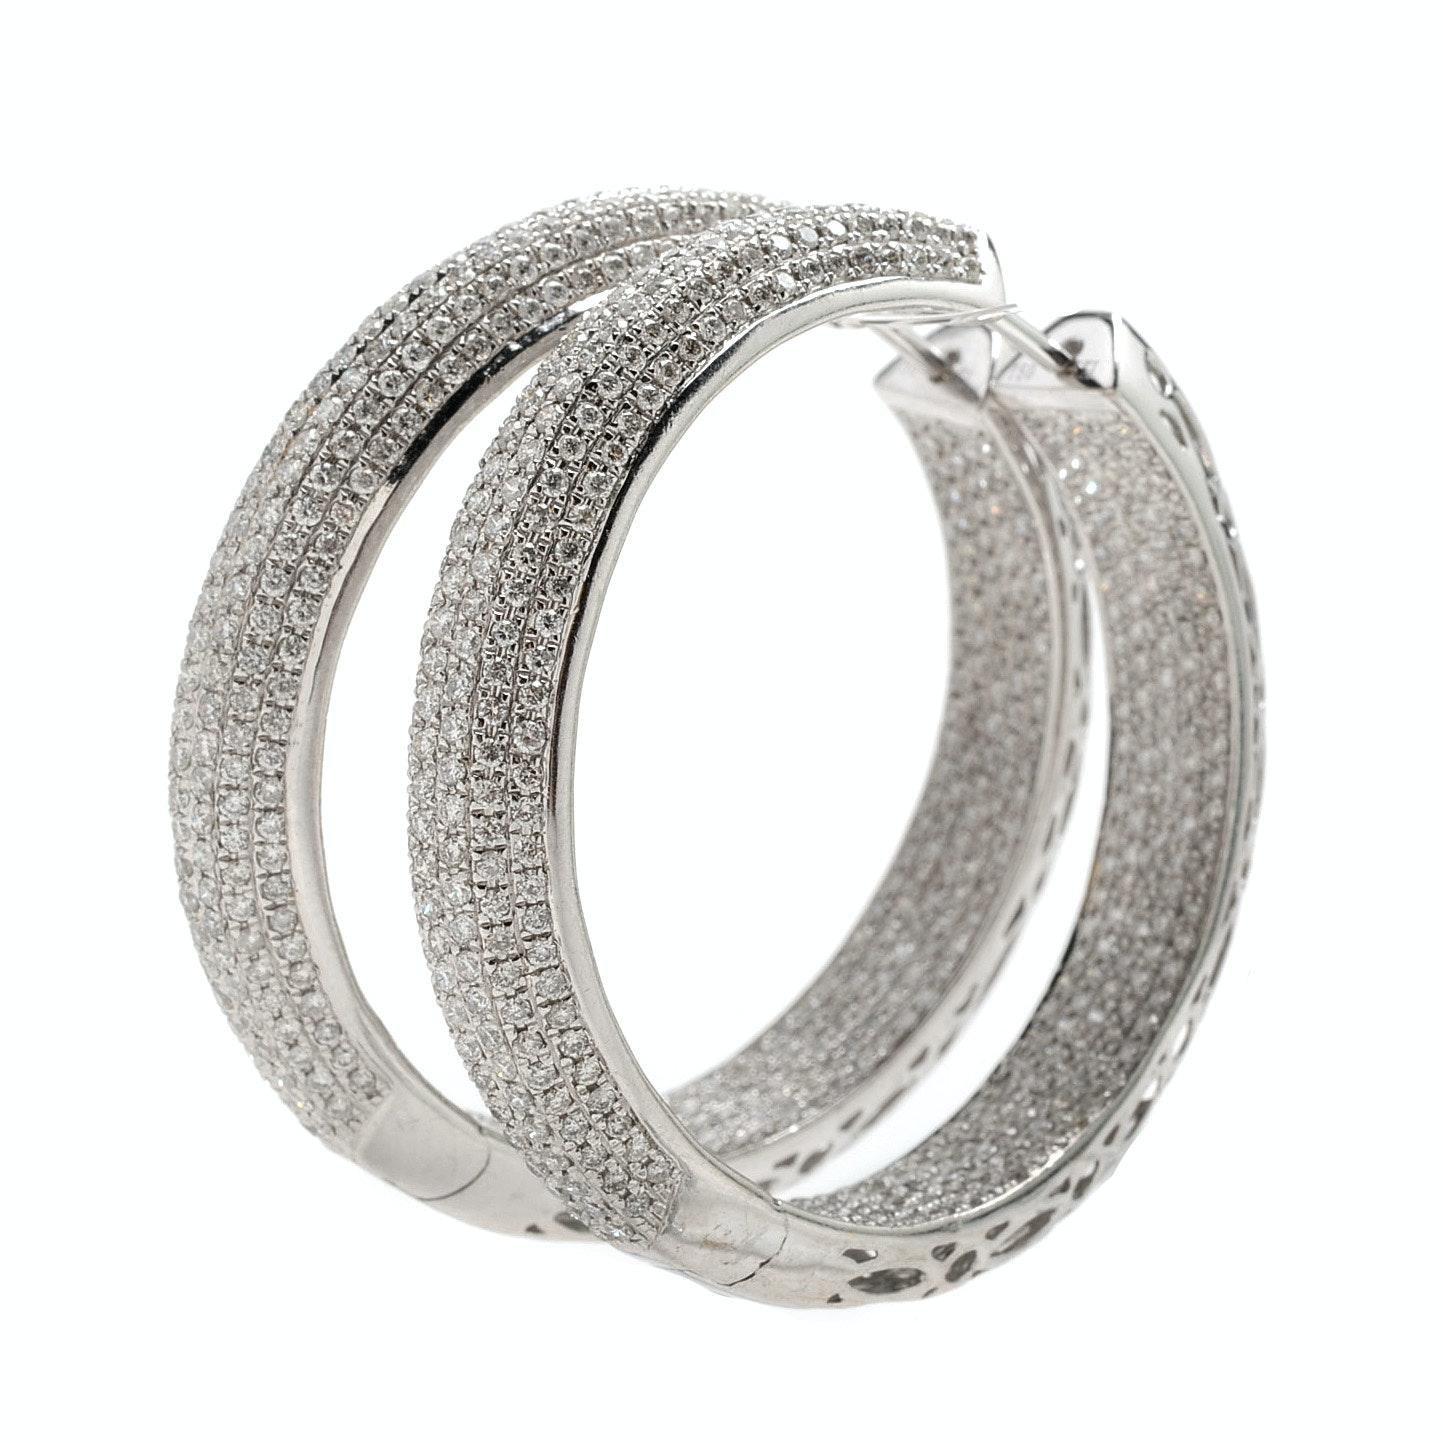 LTJ 4.37 CTW Diamond Reversible Hoop Earrings in 18K White Gold